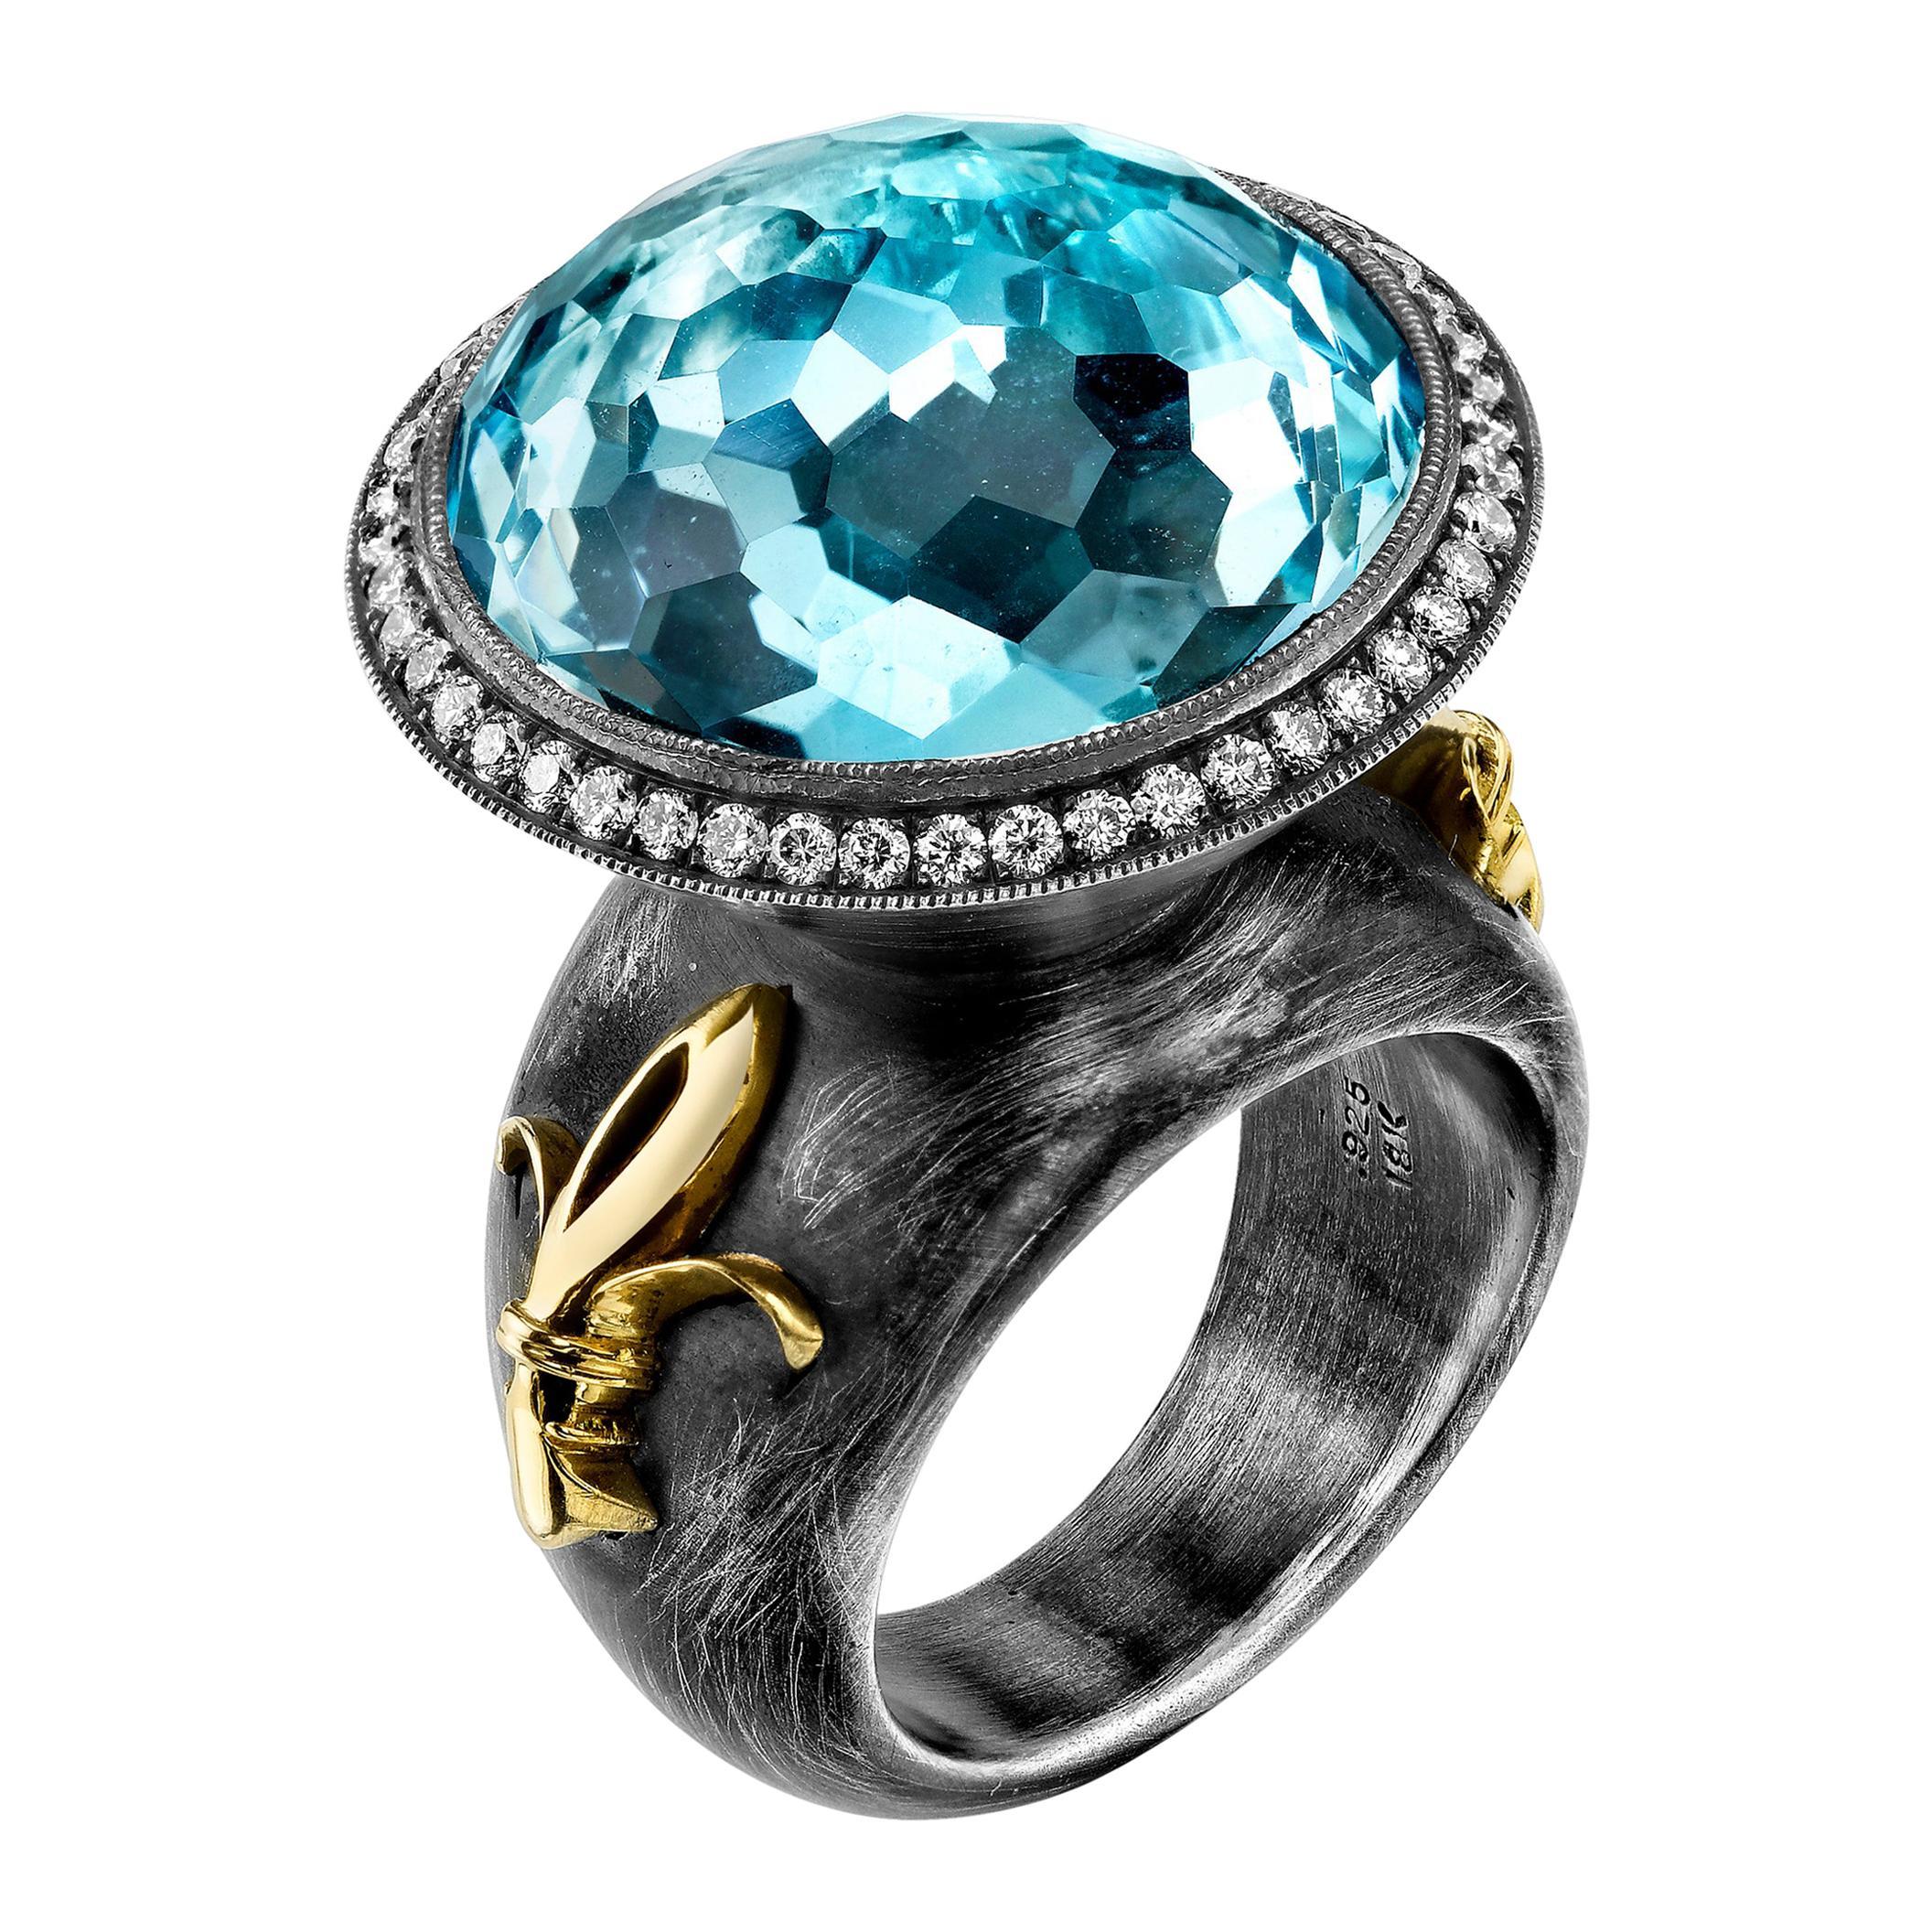 20ct Checkerboard Cut Blue Topaz Fleur De Lis Organic Silver and 18KY Ring